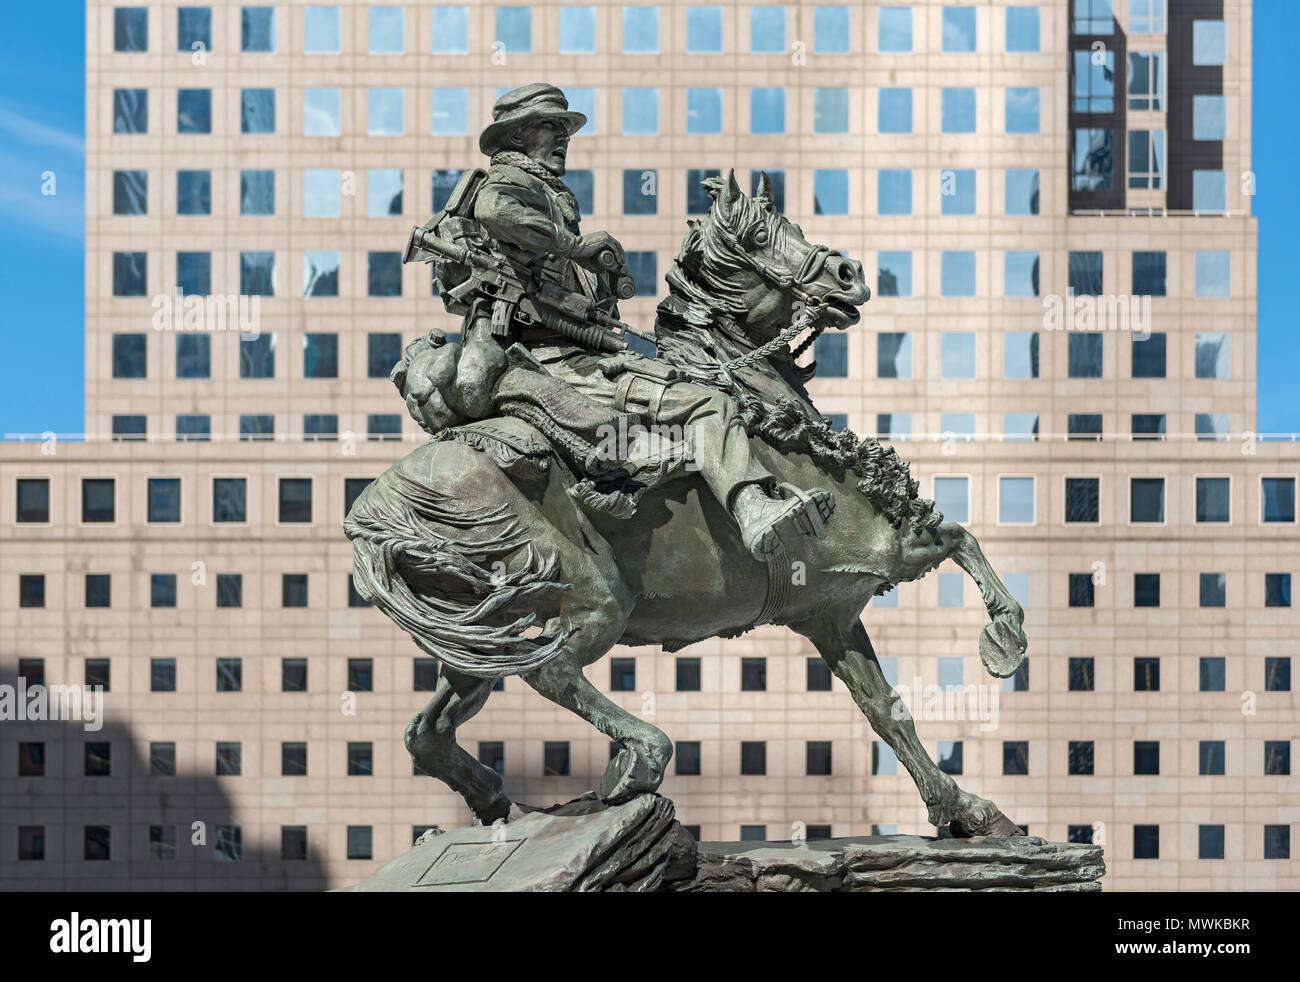 Image result for de oppresso liber statue